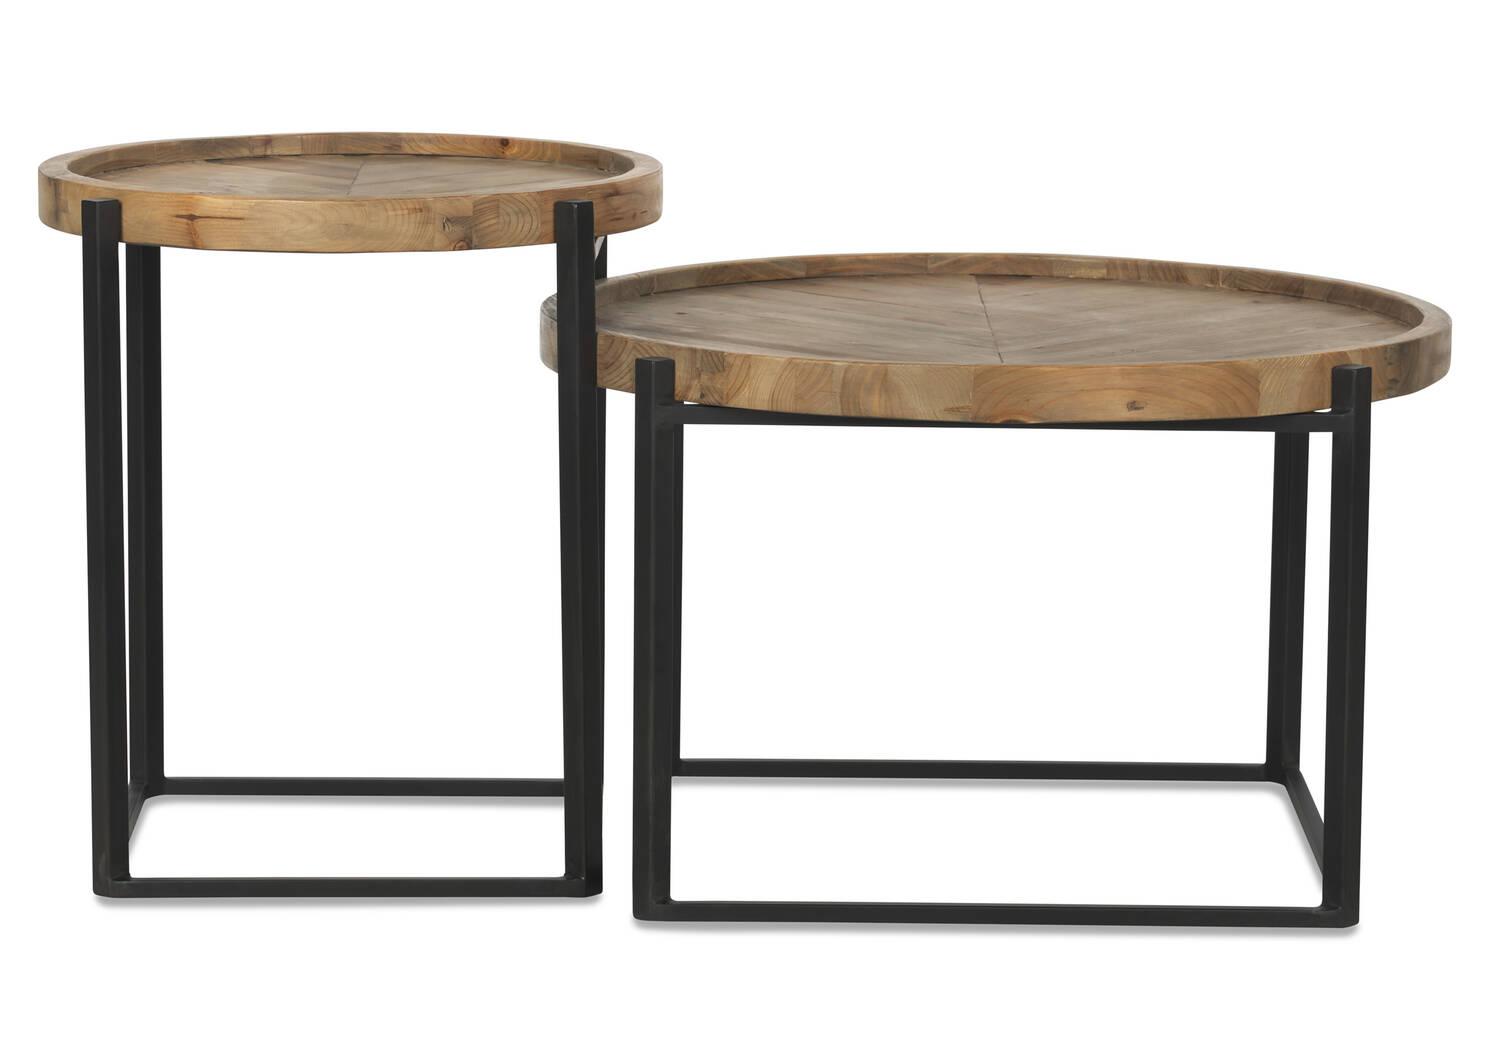 Whitley Coffee Table -Lana Sand